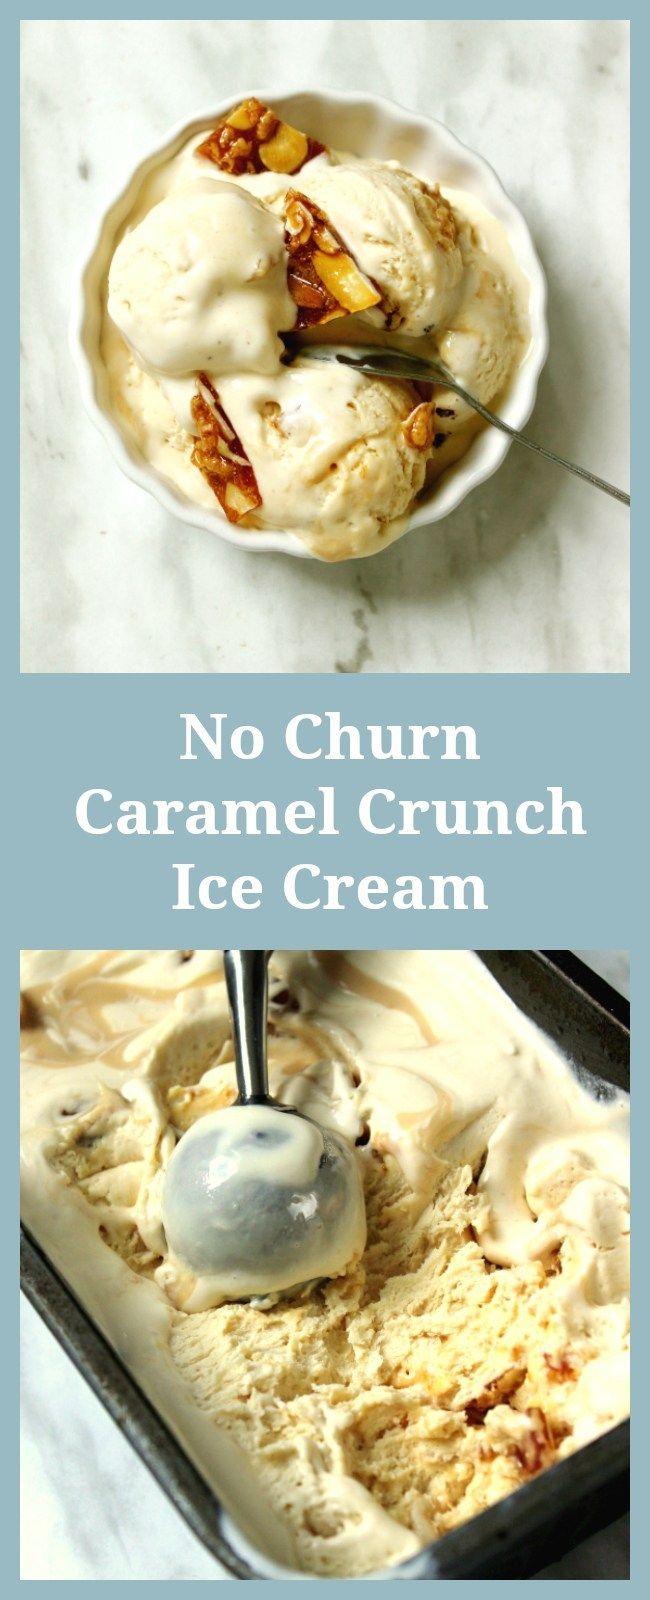 No Churn Caramel Crunch Ice Cream Recipe Caramel Crunch Food